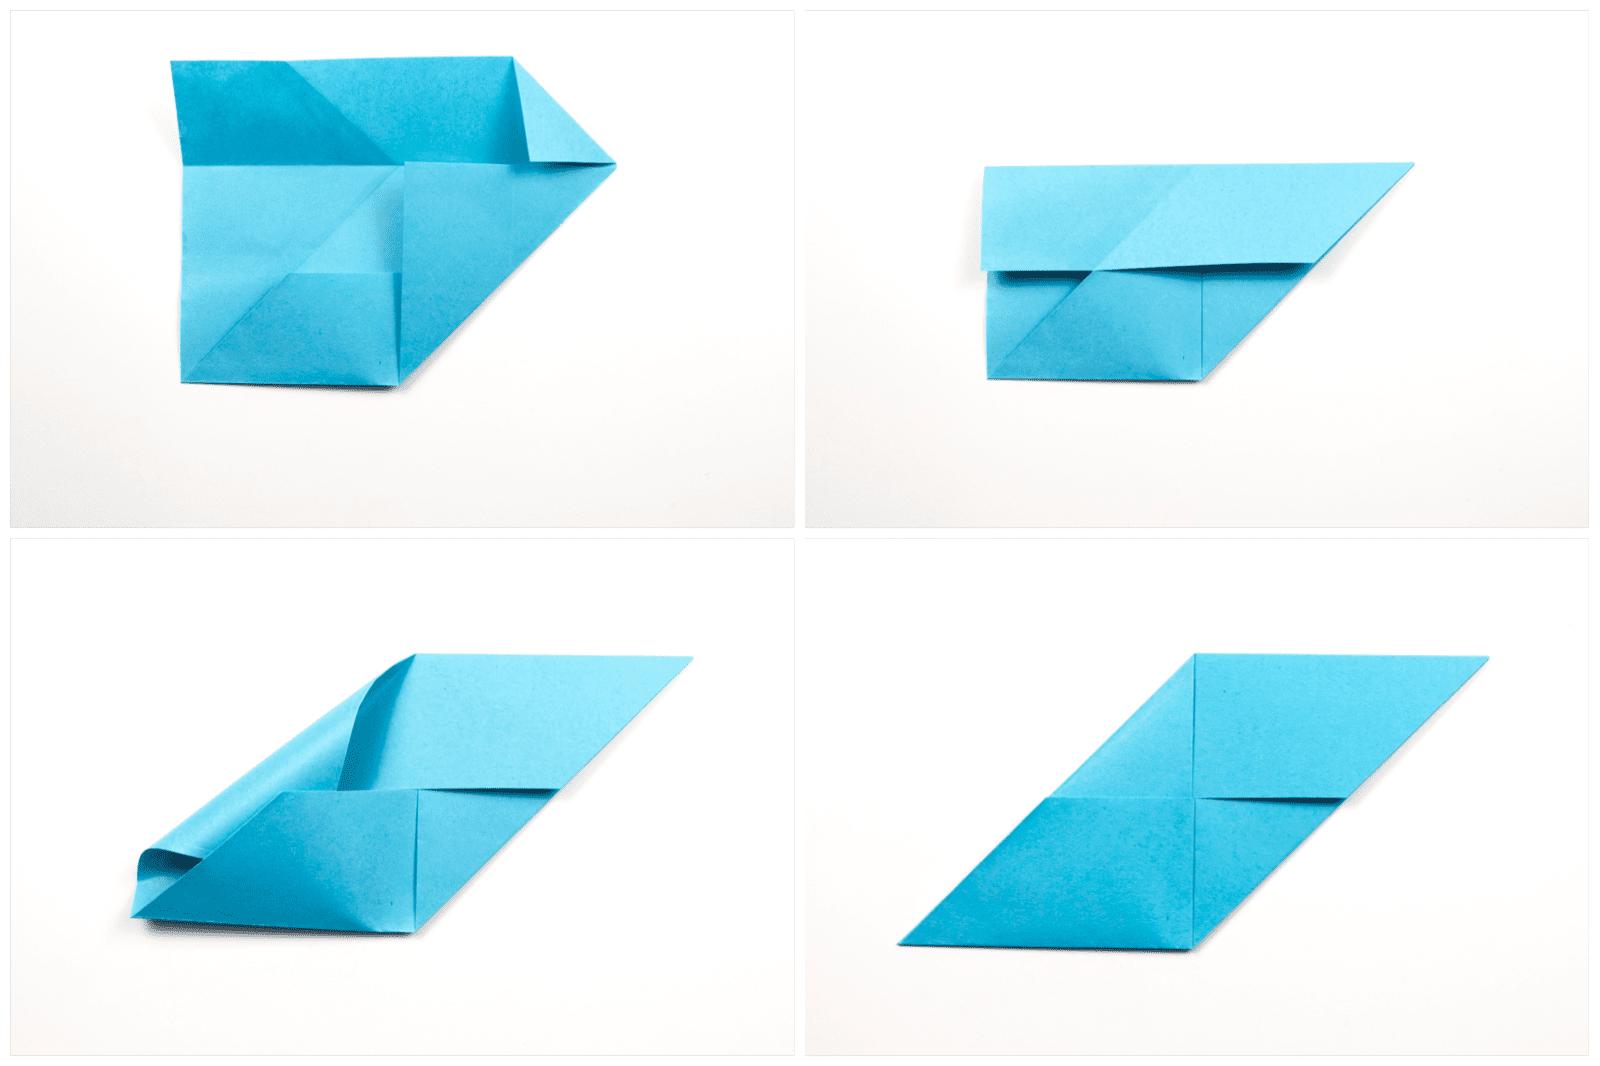 Origami Sonobe wall display step 3